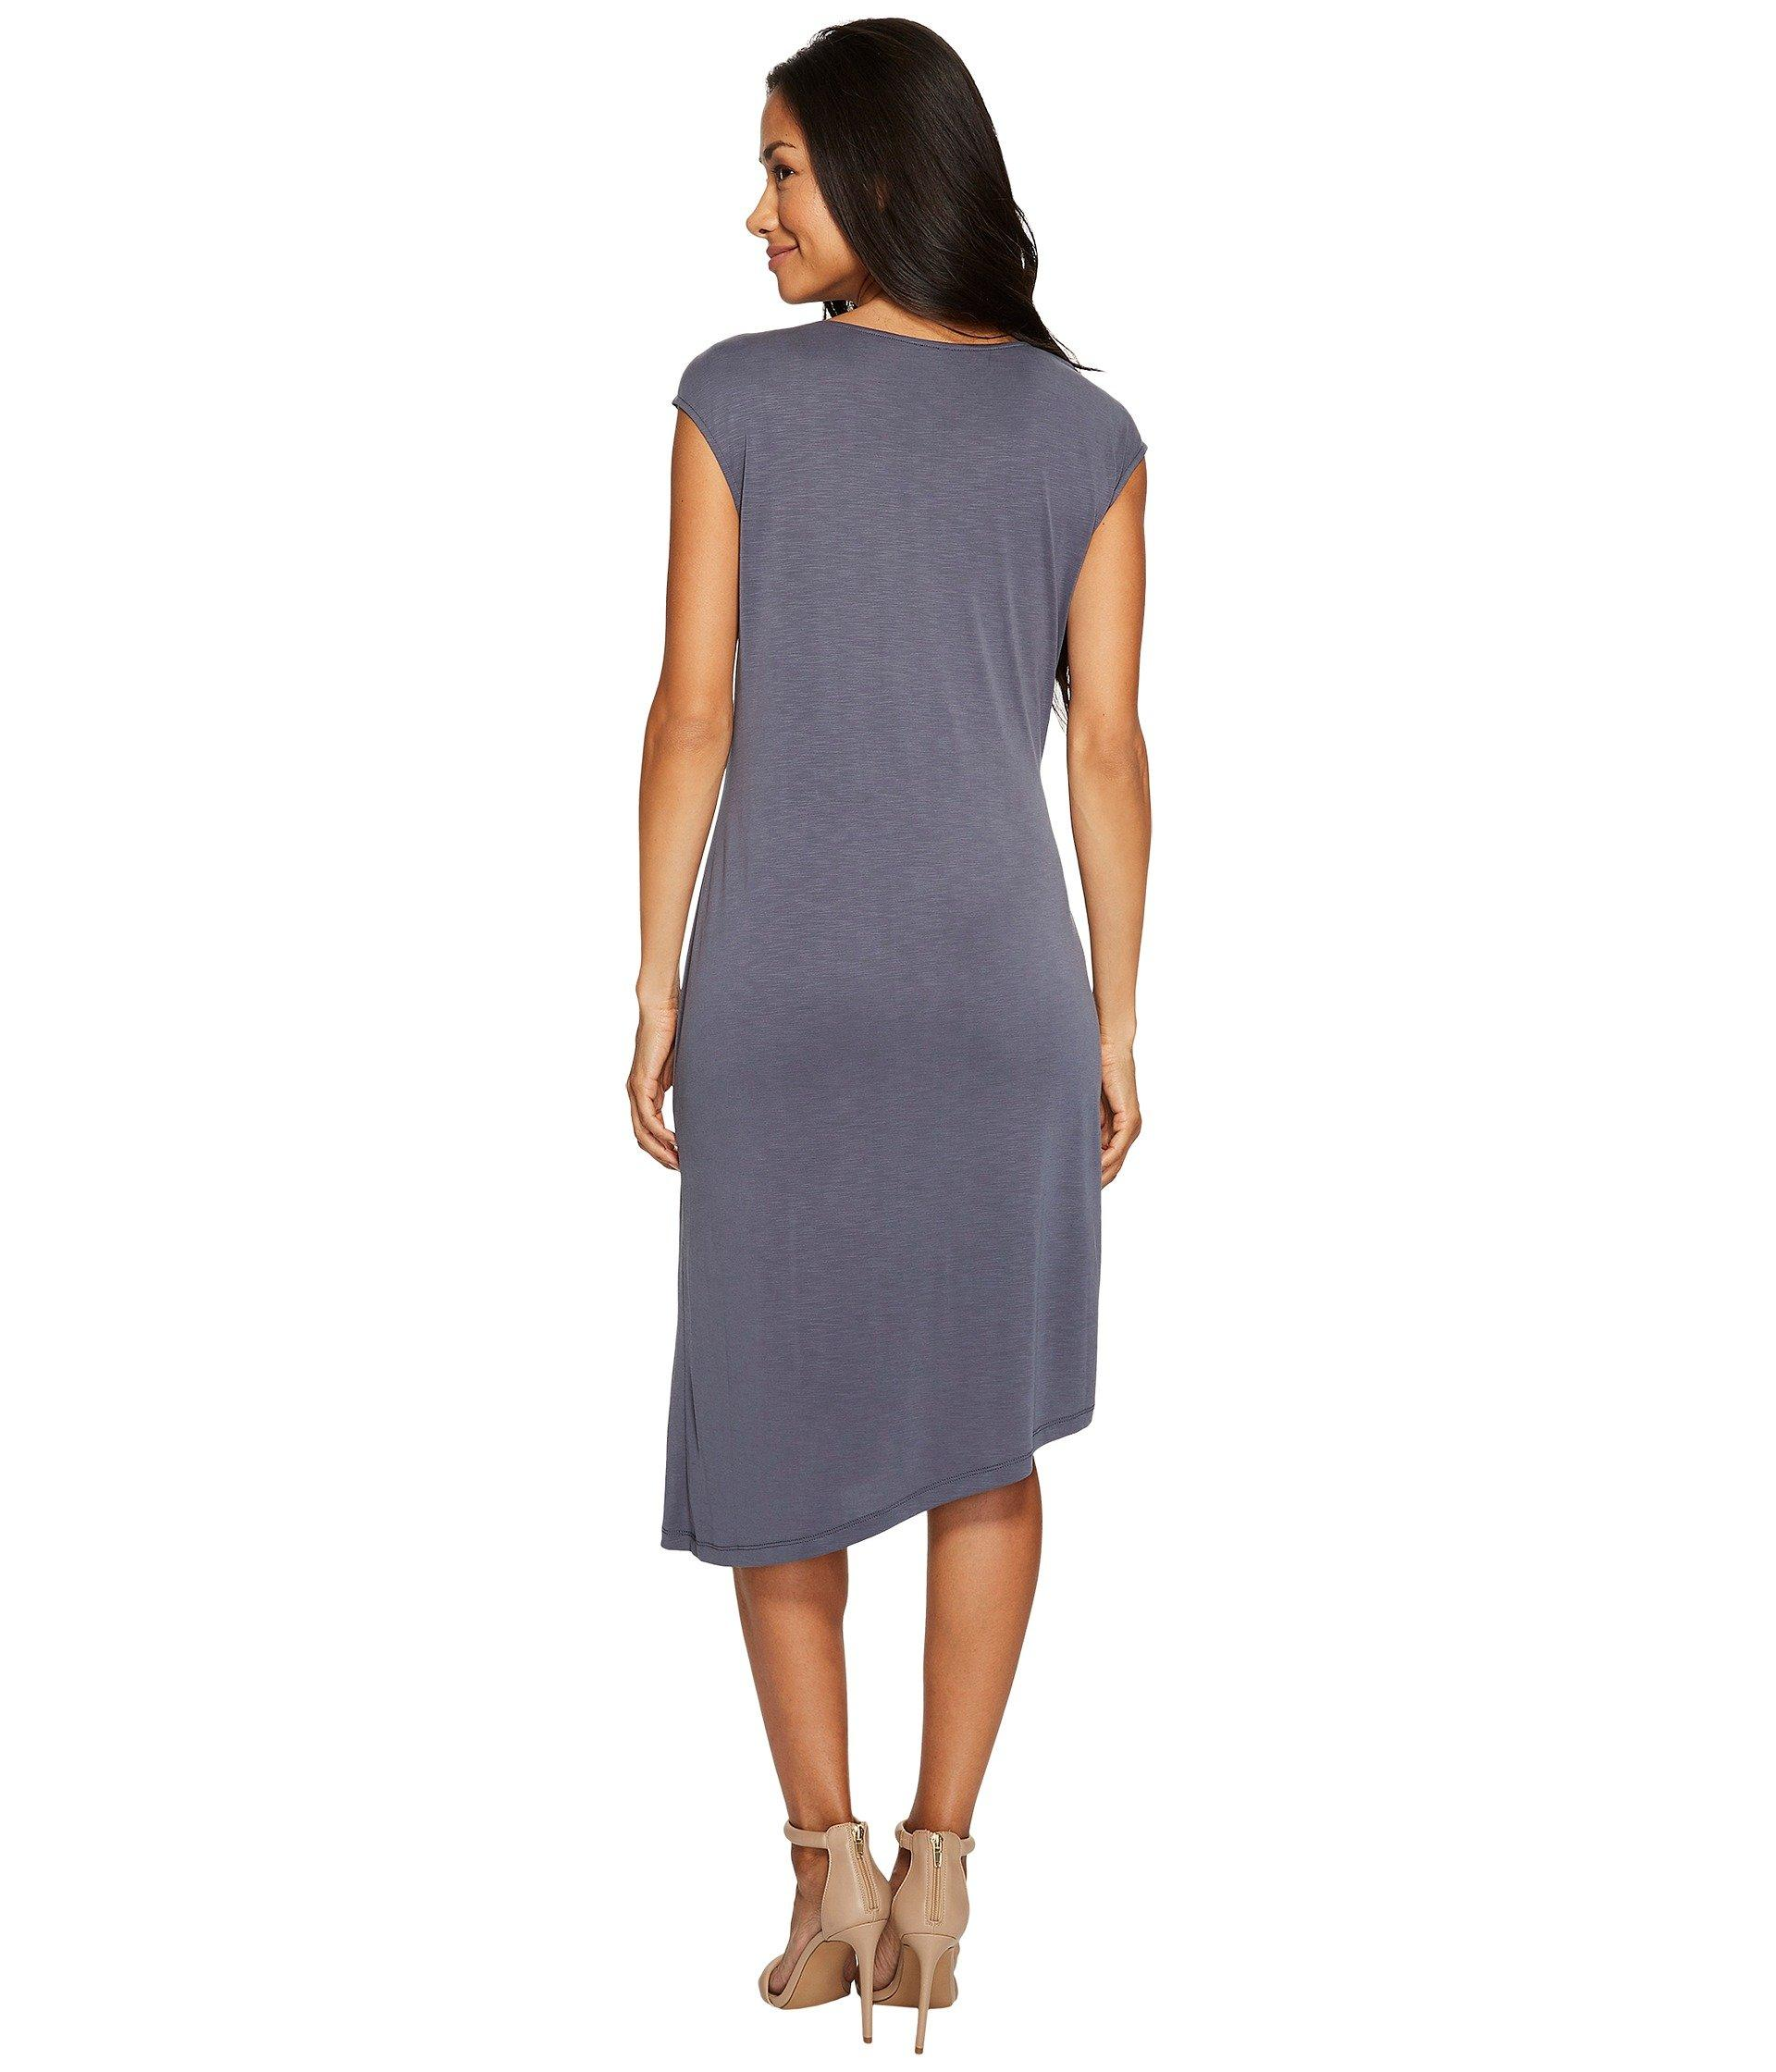 Nic Zoe Cloud Nine Women/'s Asymmetric Ruched Cap Sleeve Midi Dress